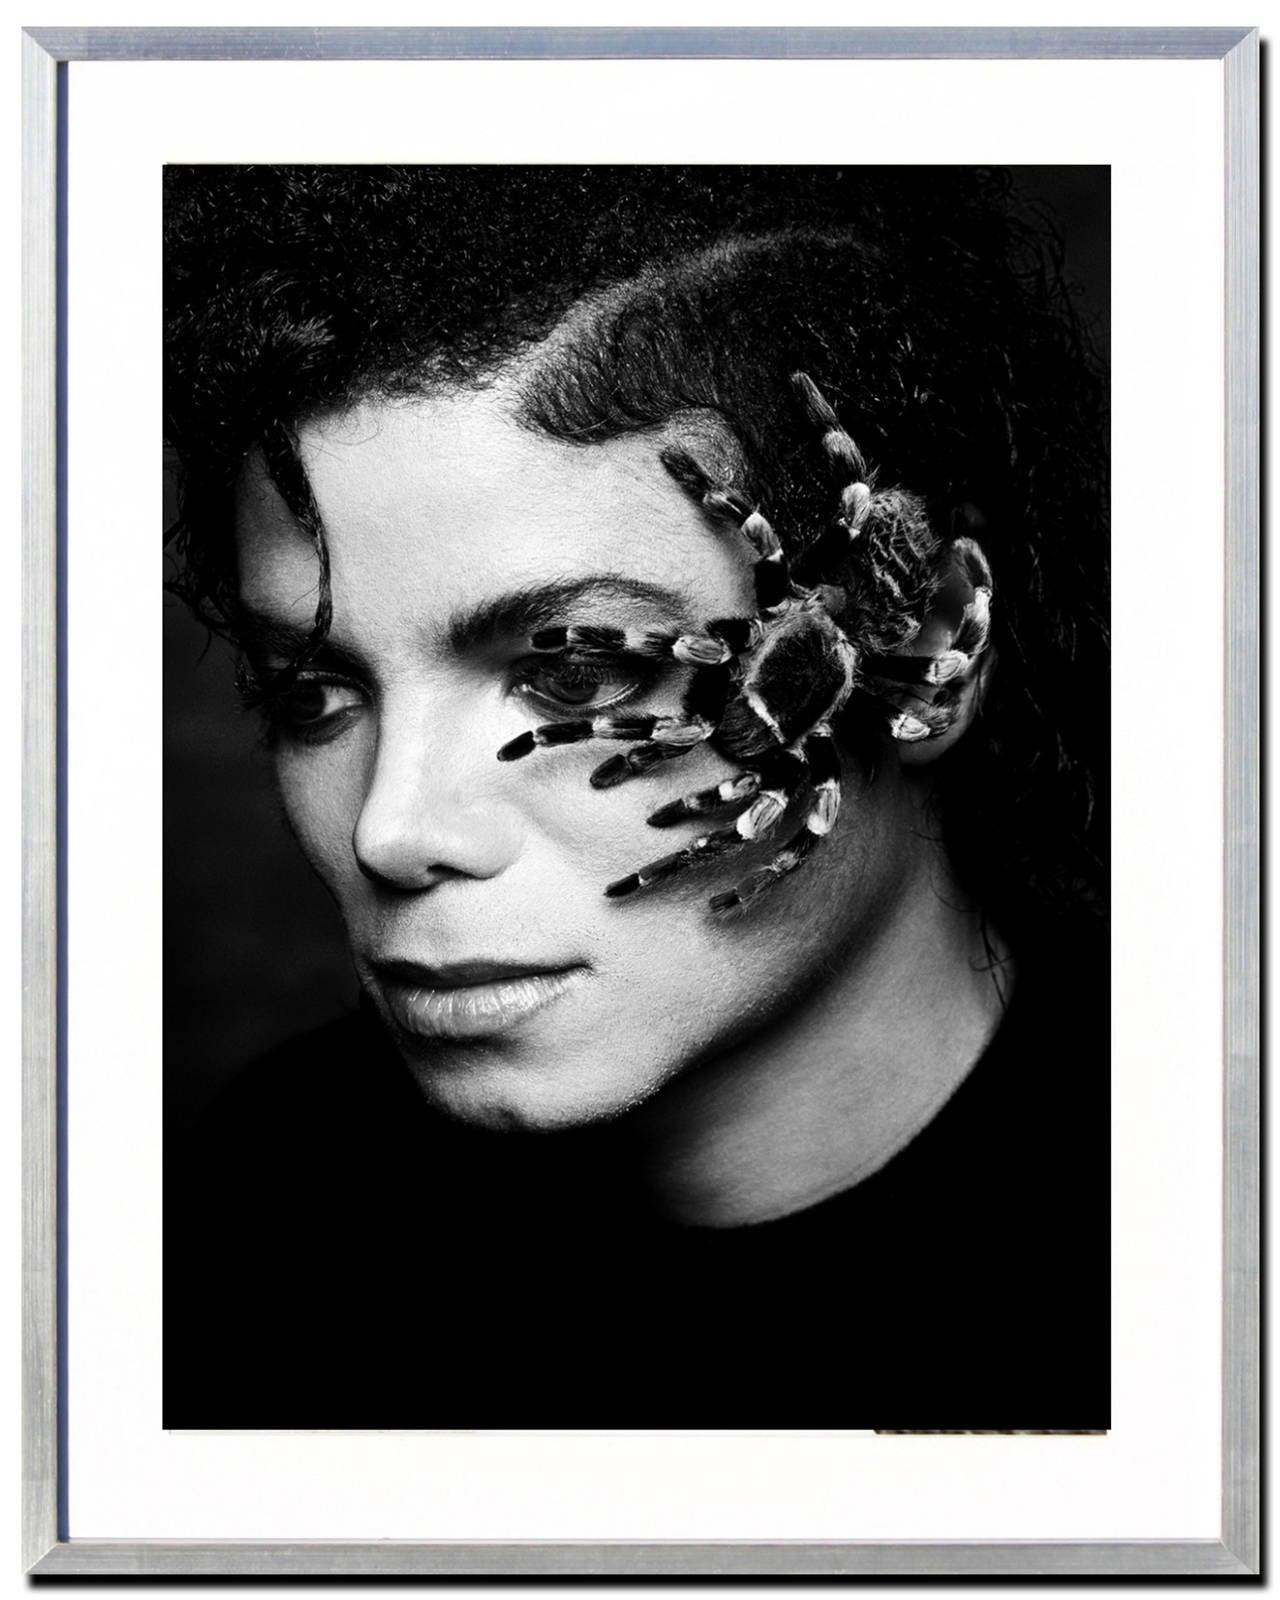 Greg Gorman - Michael Jackson Spider at 1stdibs бритни спирс